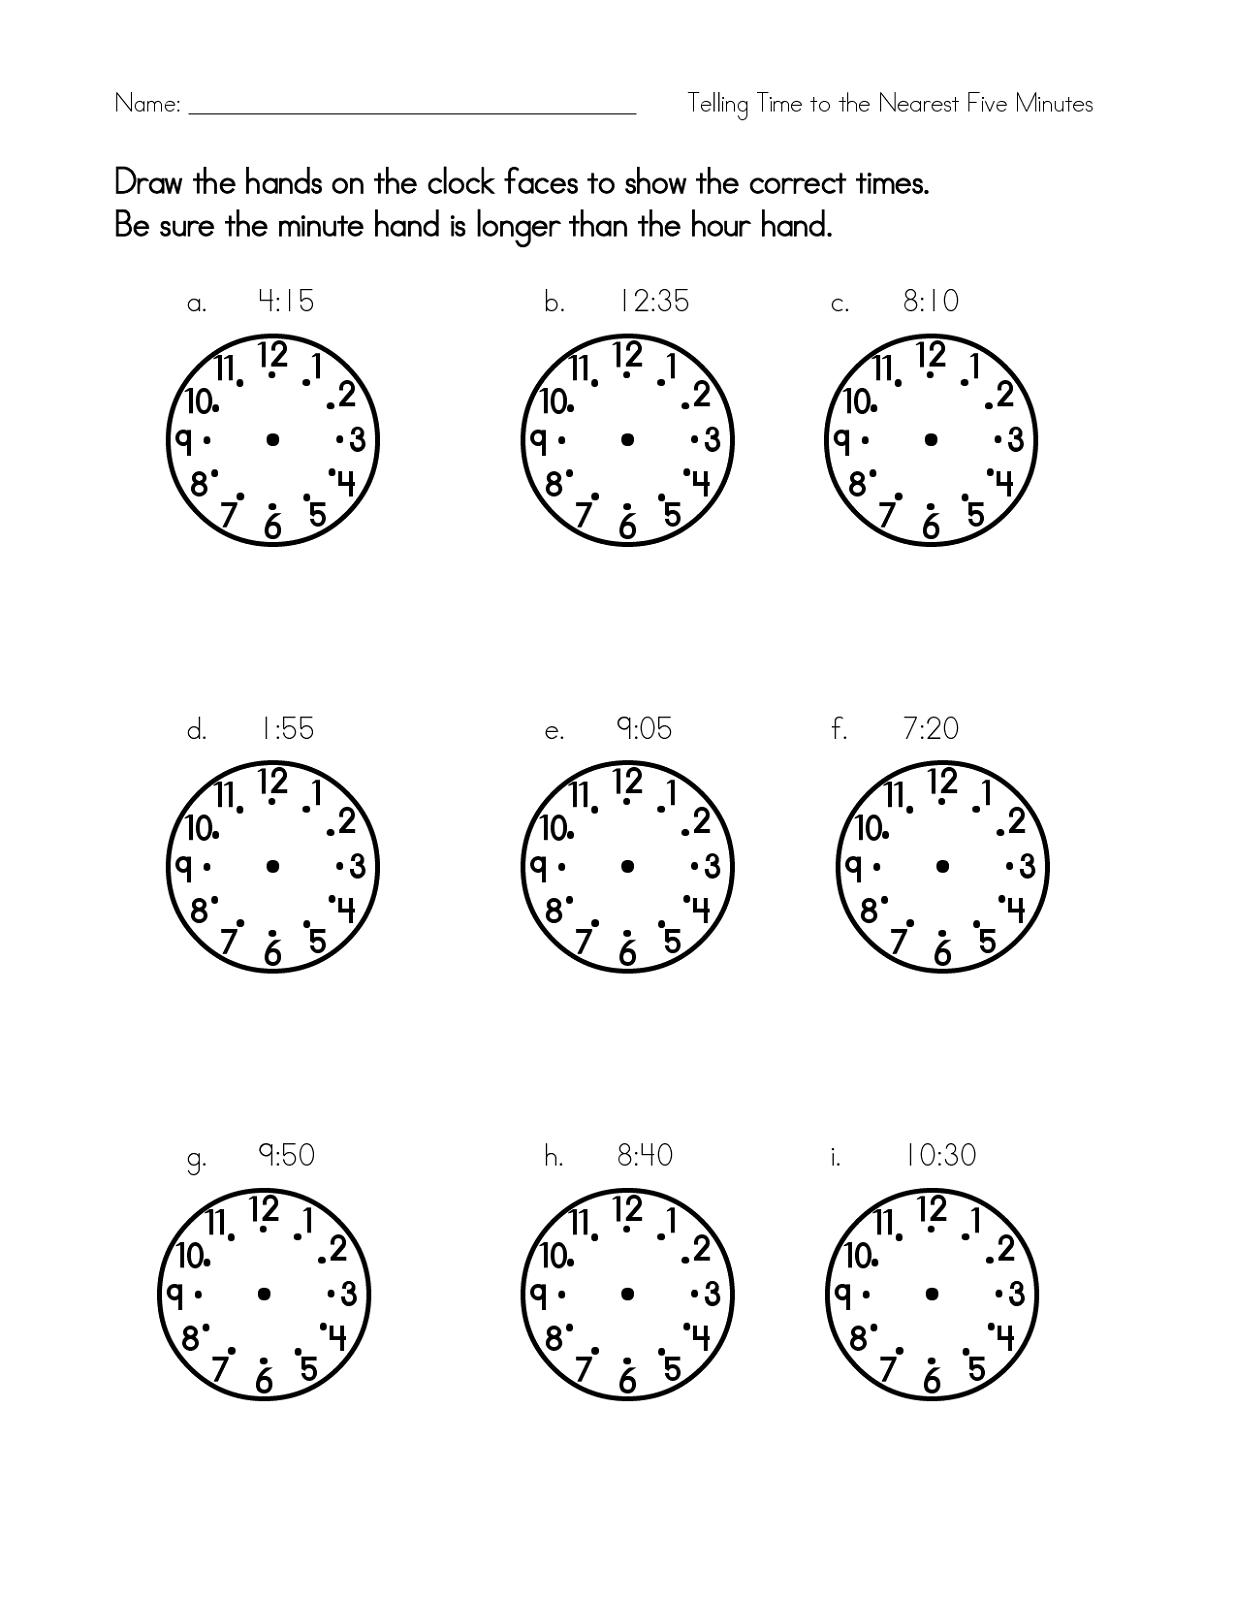 blank clock face worksheet exercise